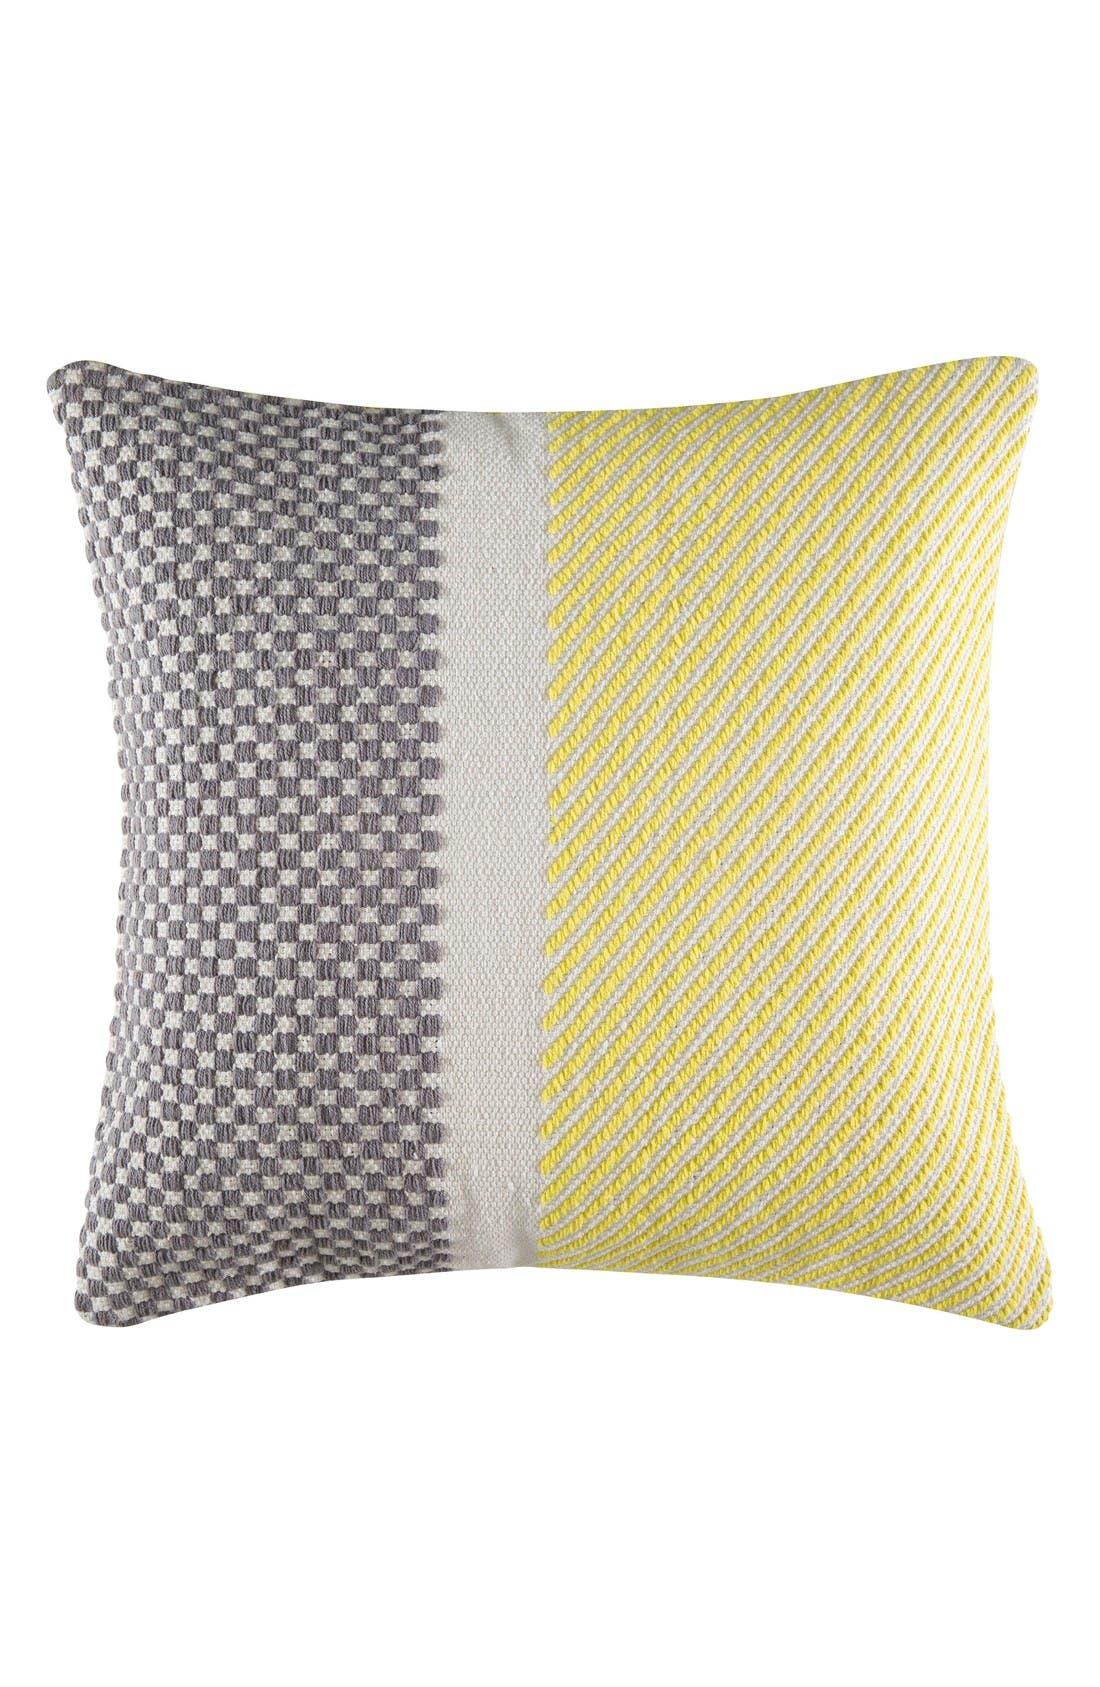 Alternate Image 1 Selected - KAS Designs Riley Jax Pillow